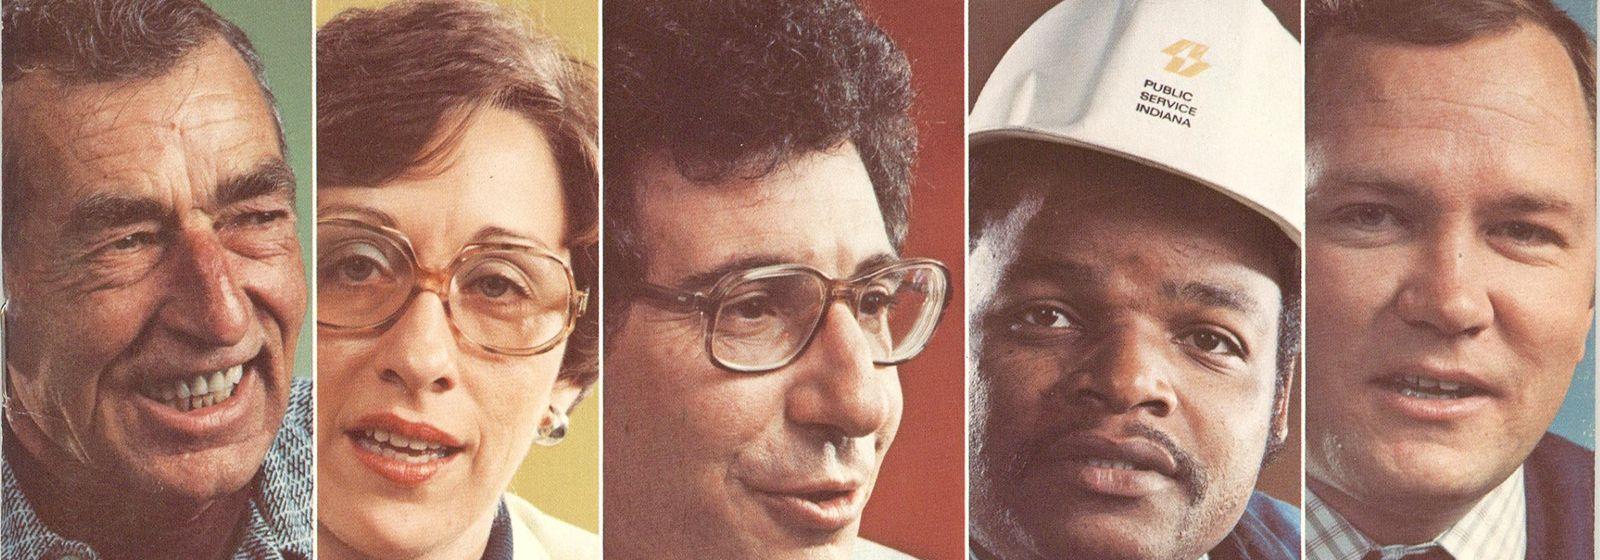 Retro photos: classic annual report covers